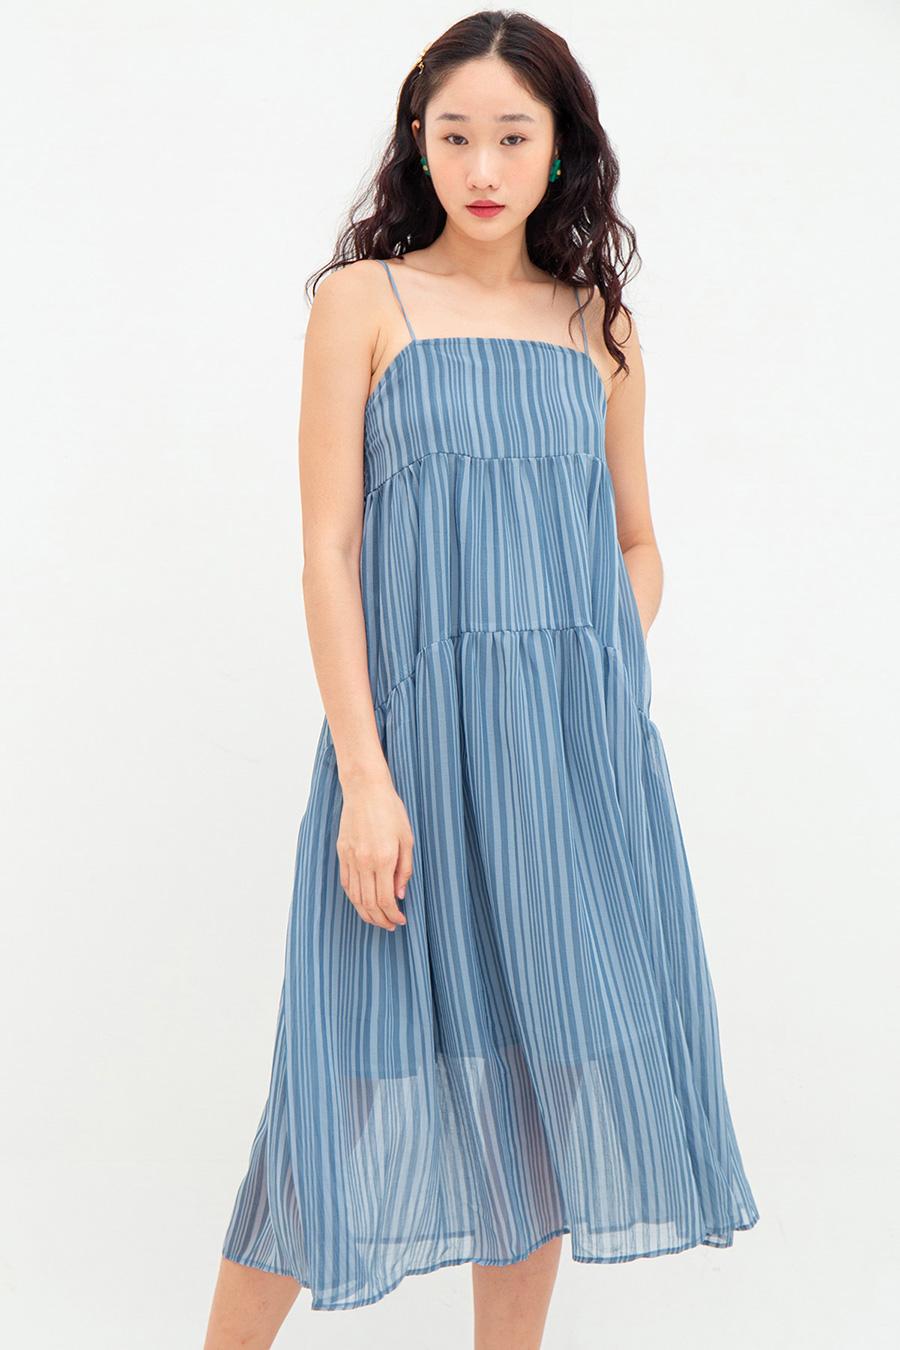 OLIVIA DRESS - MALIBU [BY MODPARADE]